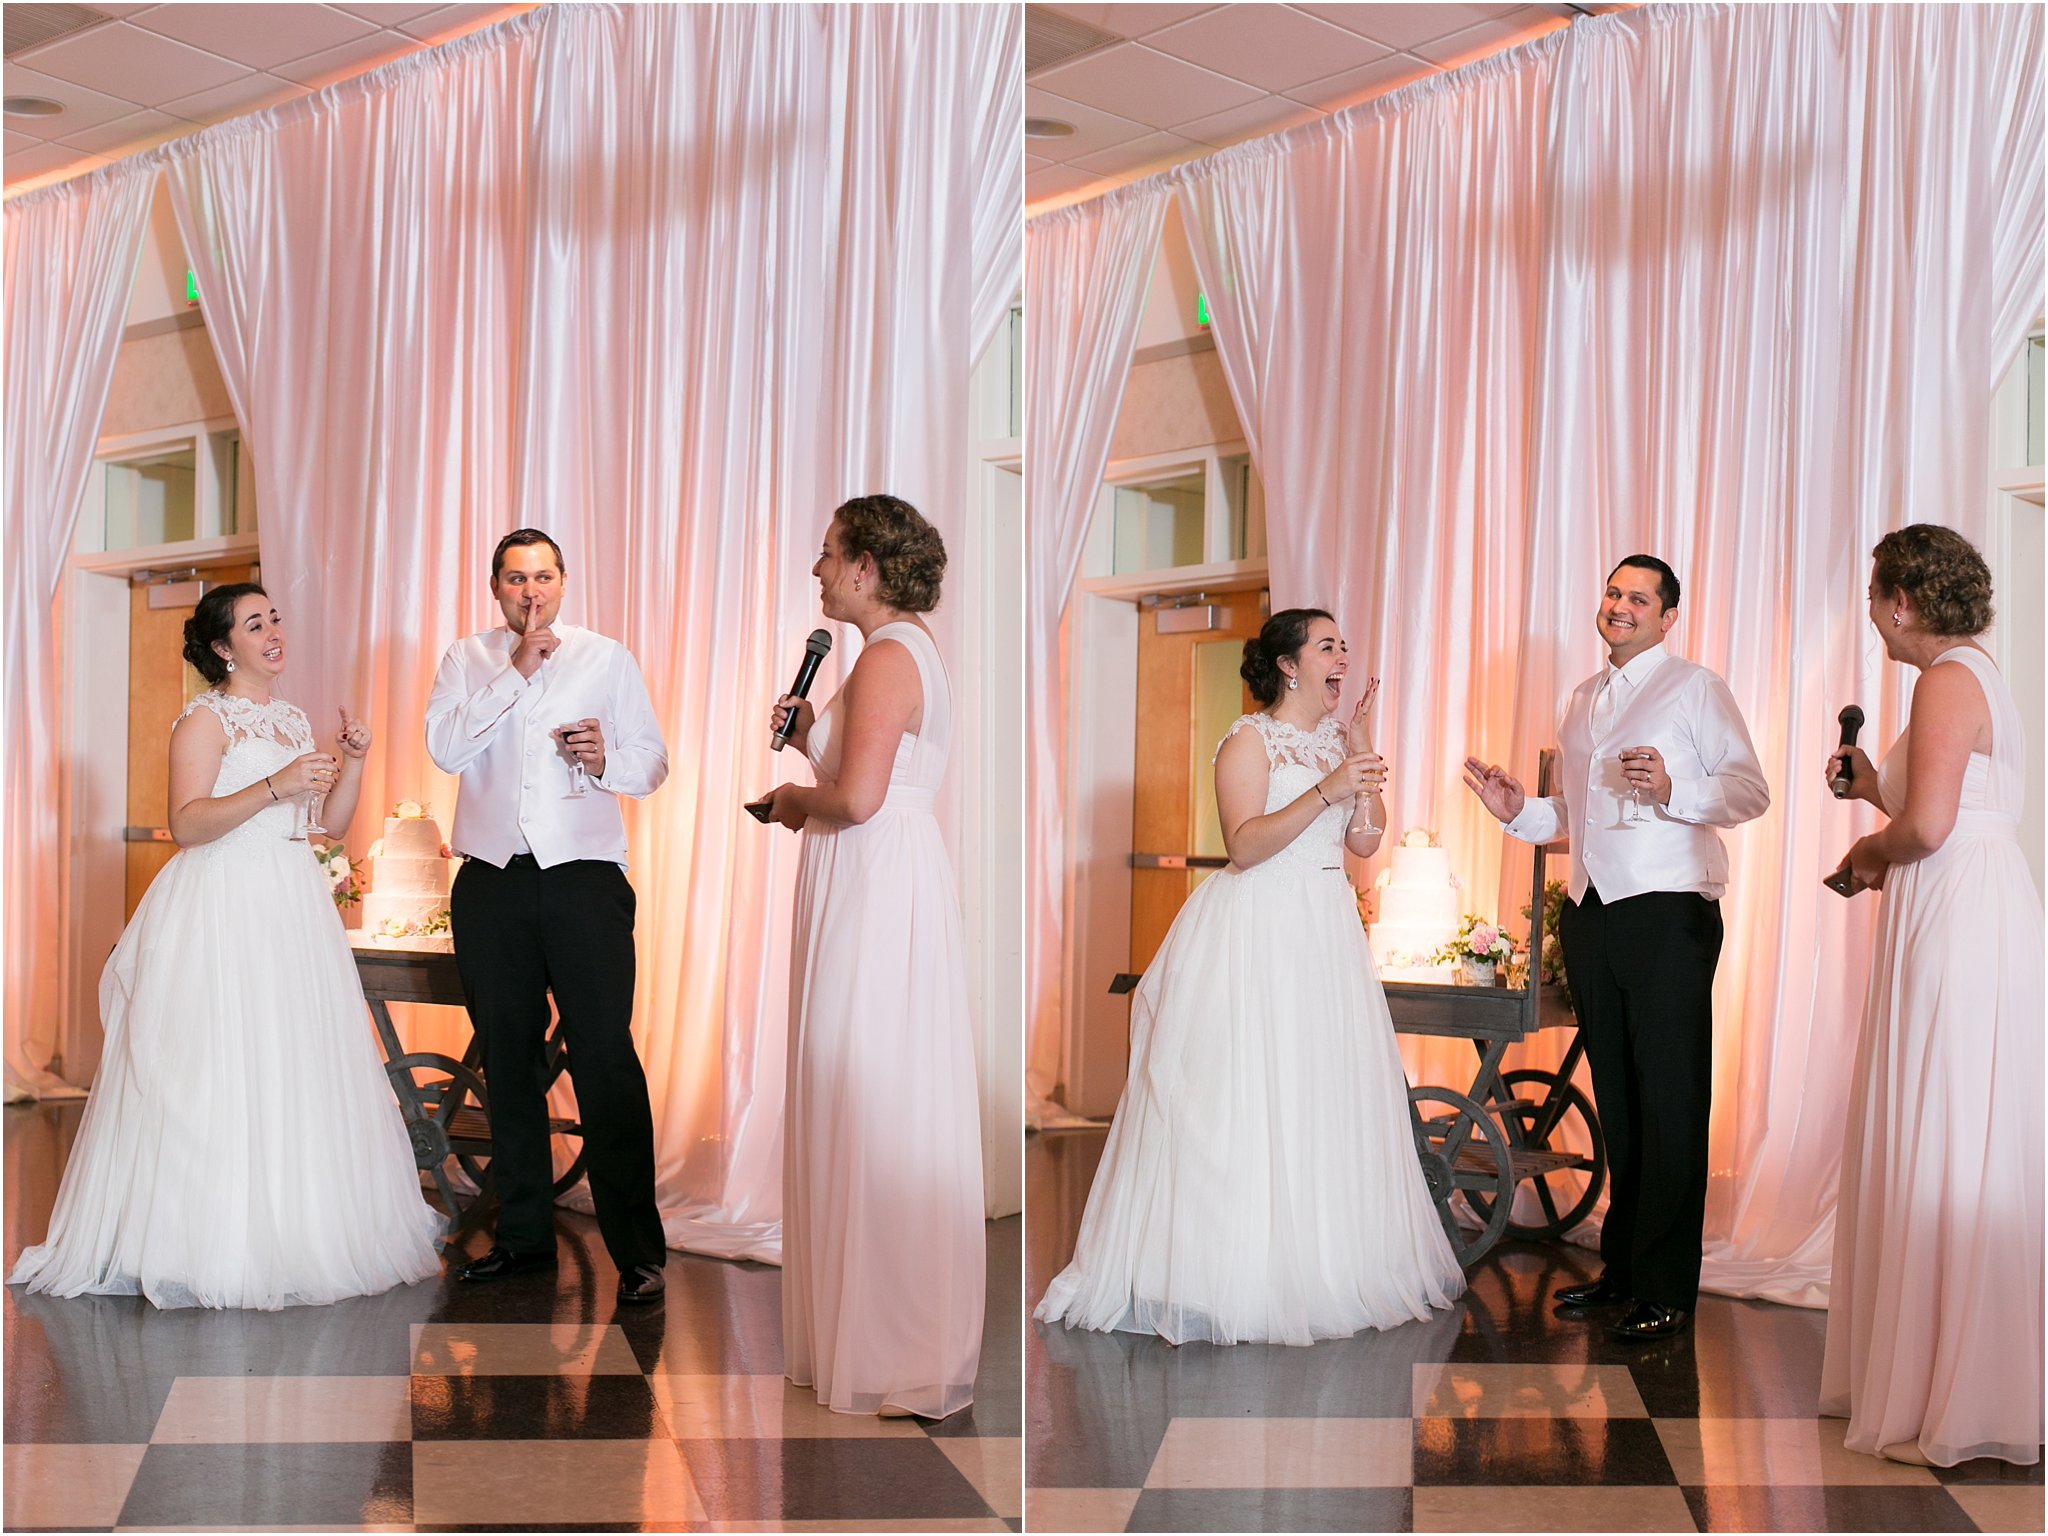 jessica_ryan_photography_virginia_wedding_photographer_wedding_hurricane_norfolk_botanical_gardens_hurricane_matthew_wedding_3639